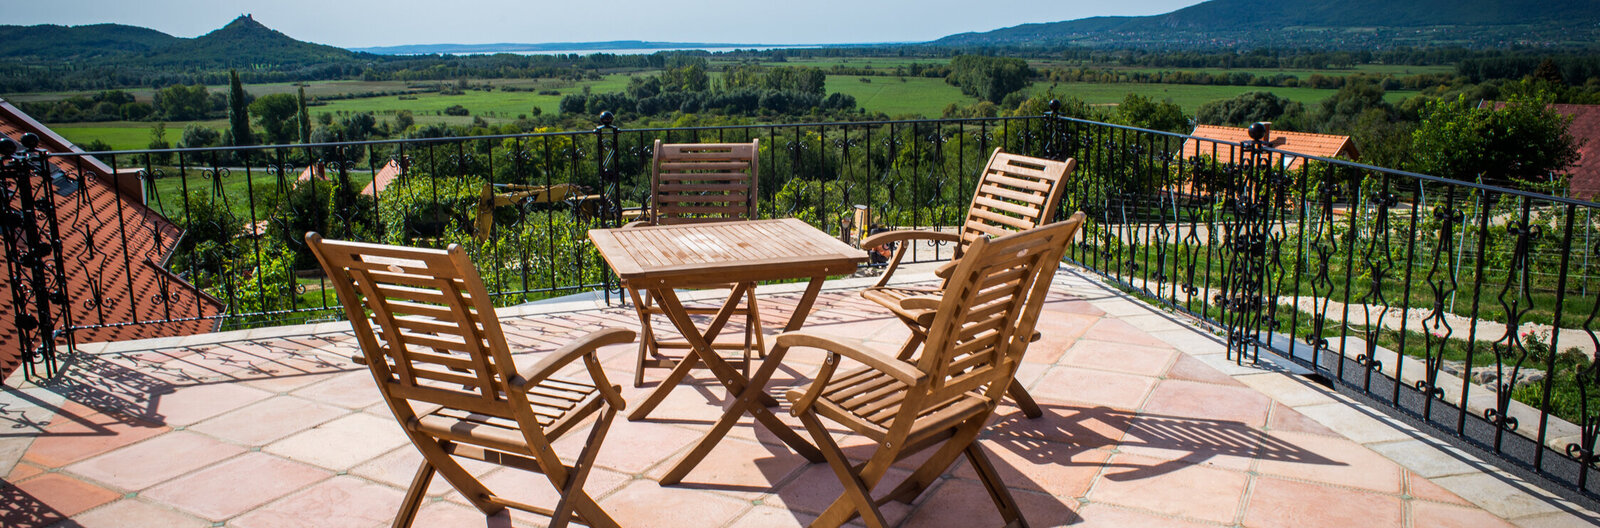 Stylish rooms and lavish wines – 11 Balaton wineries with lodging